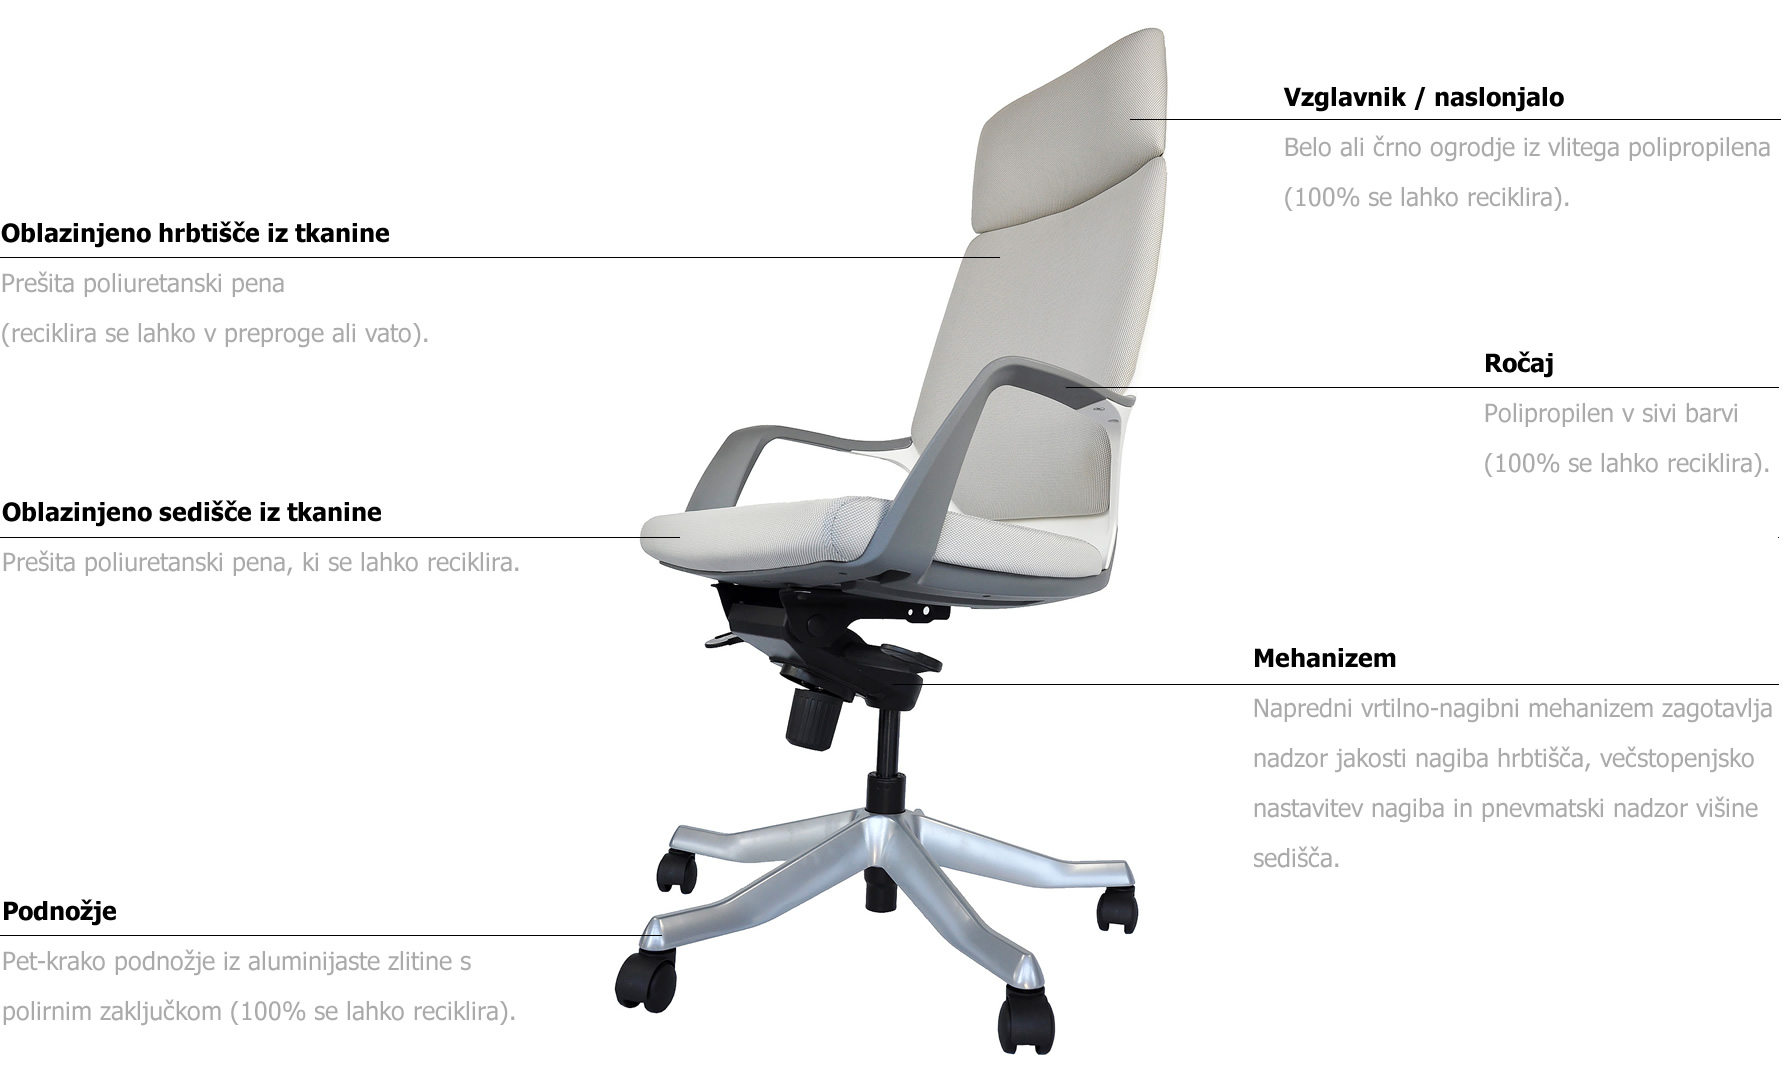 ergovision istyle racunalniski stol opis 02